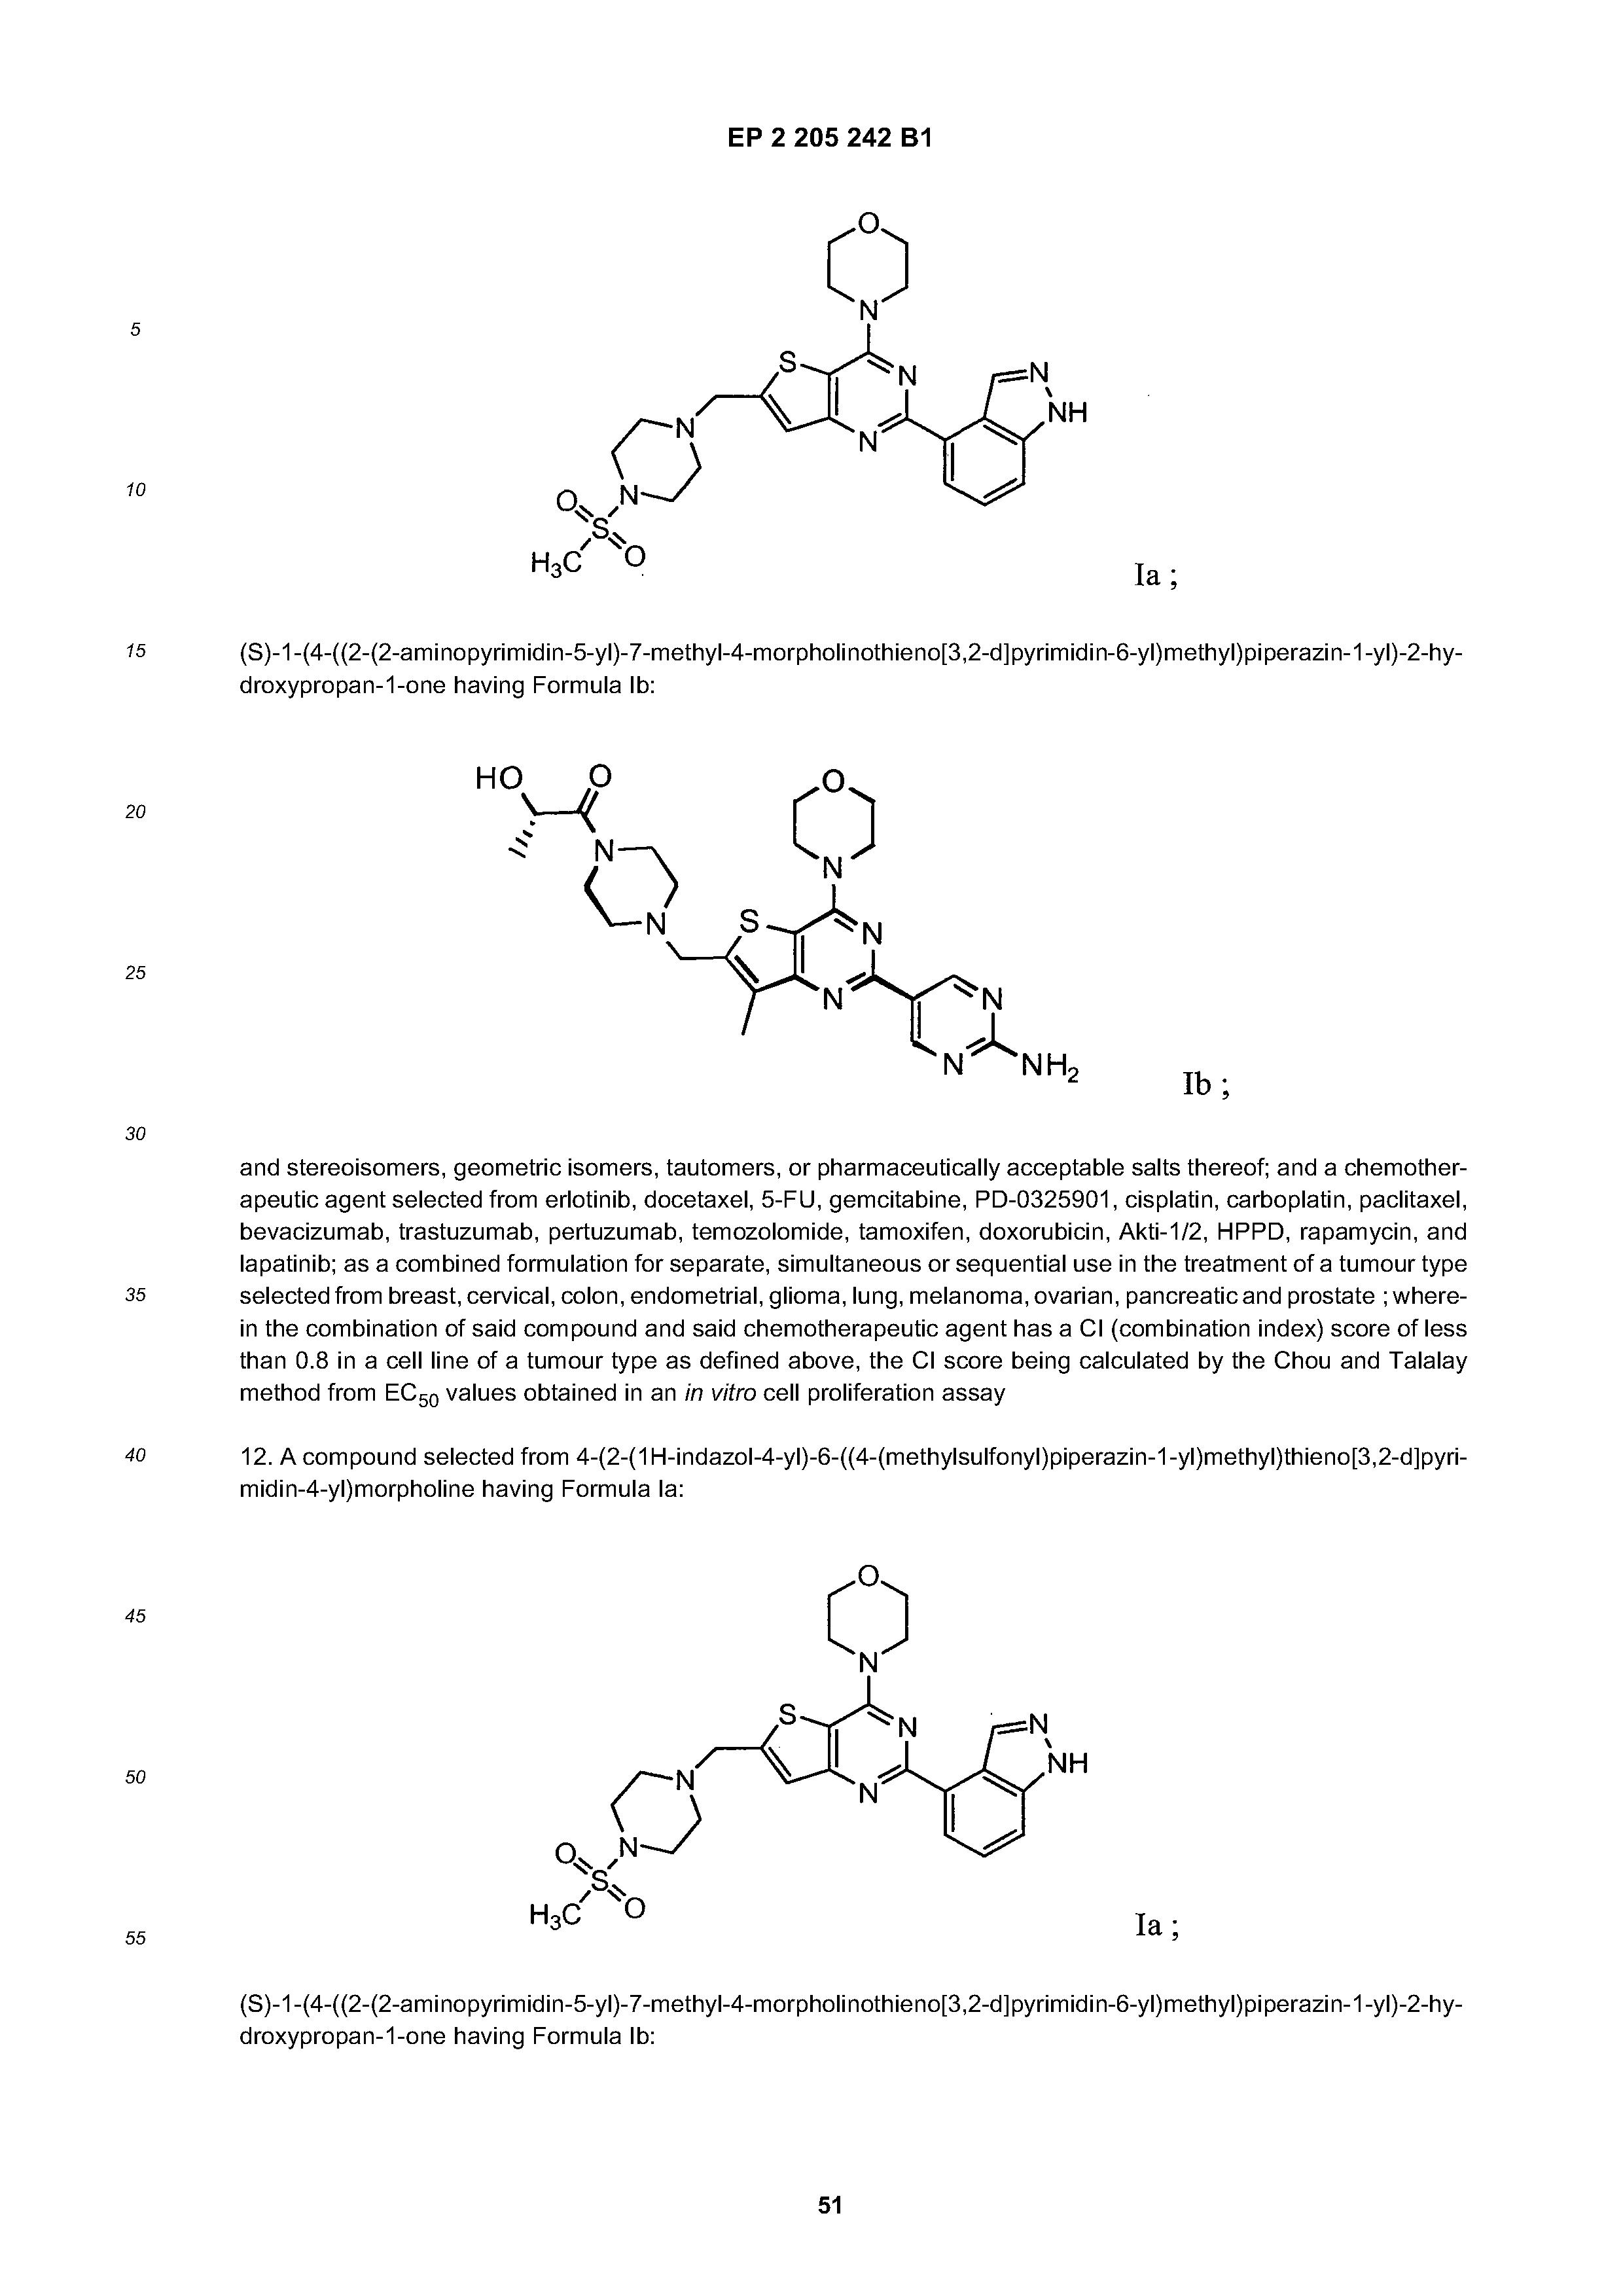 EP 2205242 B1 - Combinations Of Phosphoinositide 3-kinase Inhibitor